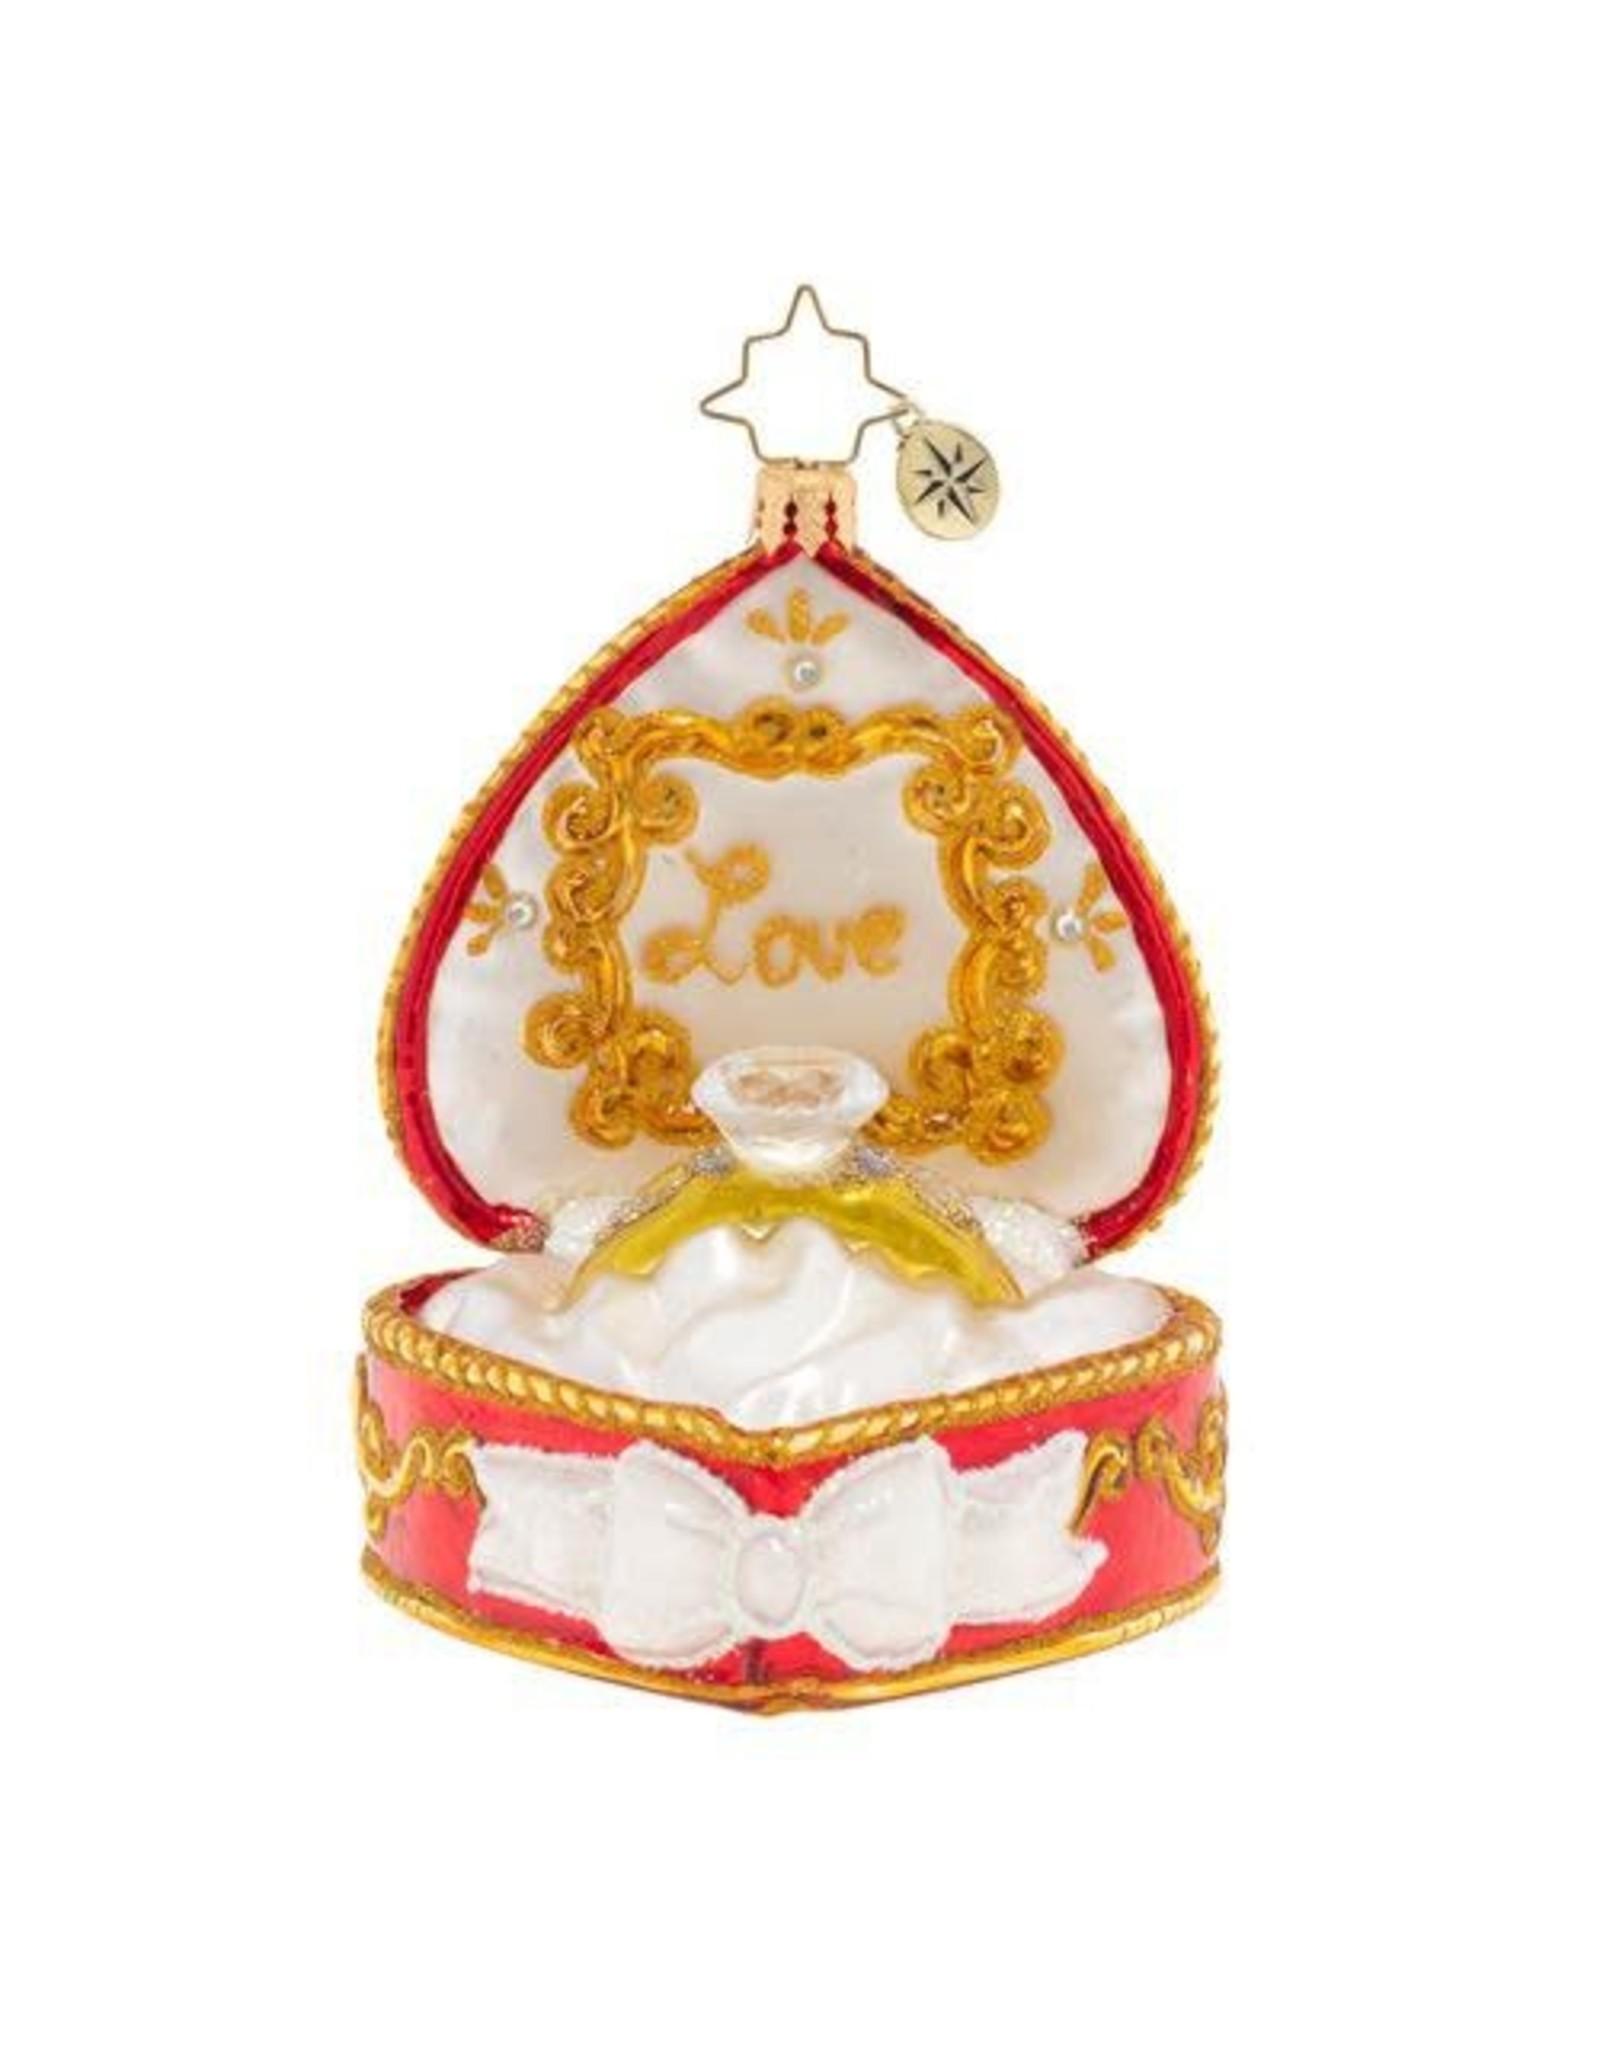 Christopher Radko Forever And Always Heart Ring Box Christmas Ornament